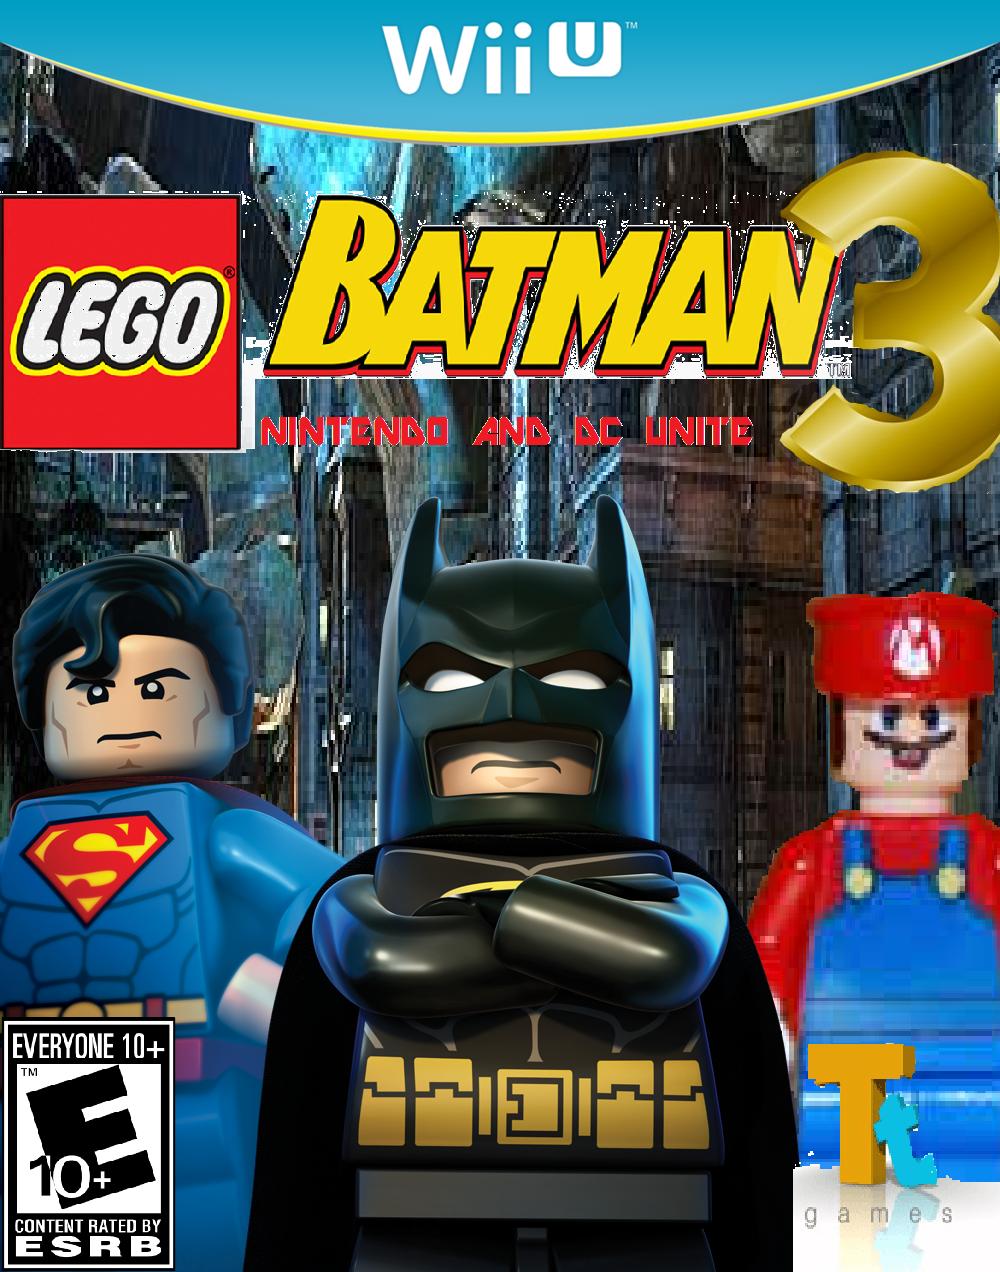 Lego Batman 3: Nintendo and DC Unite - Fantendo, the Video ...